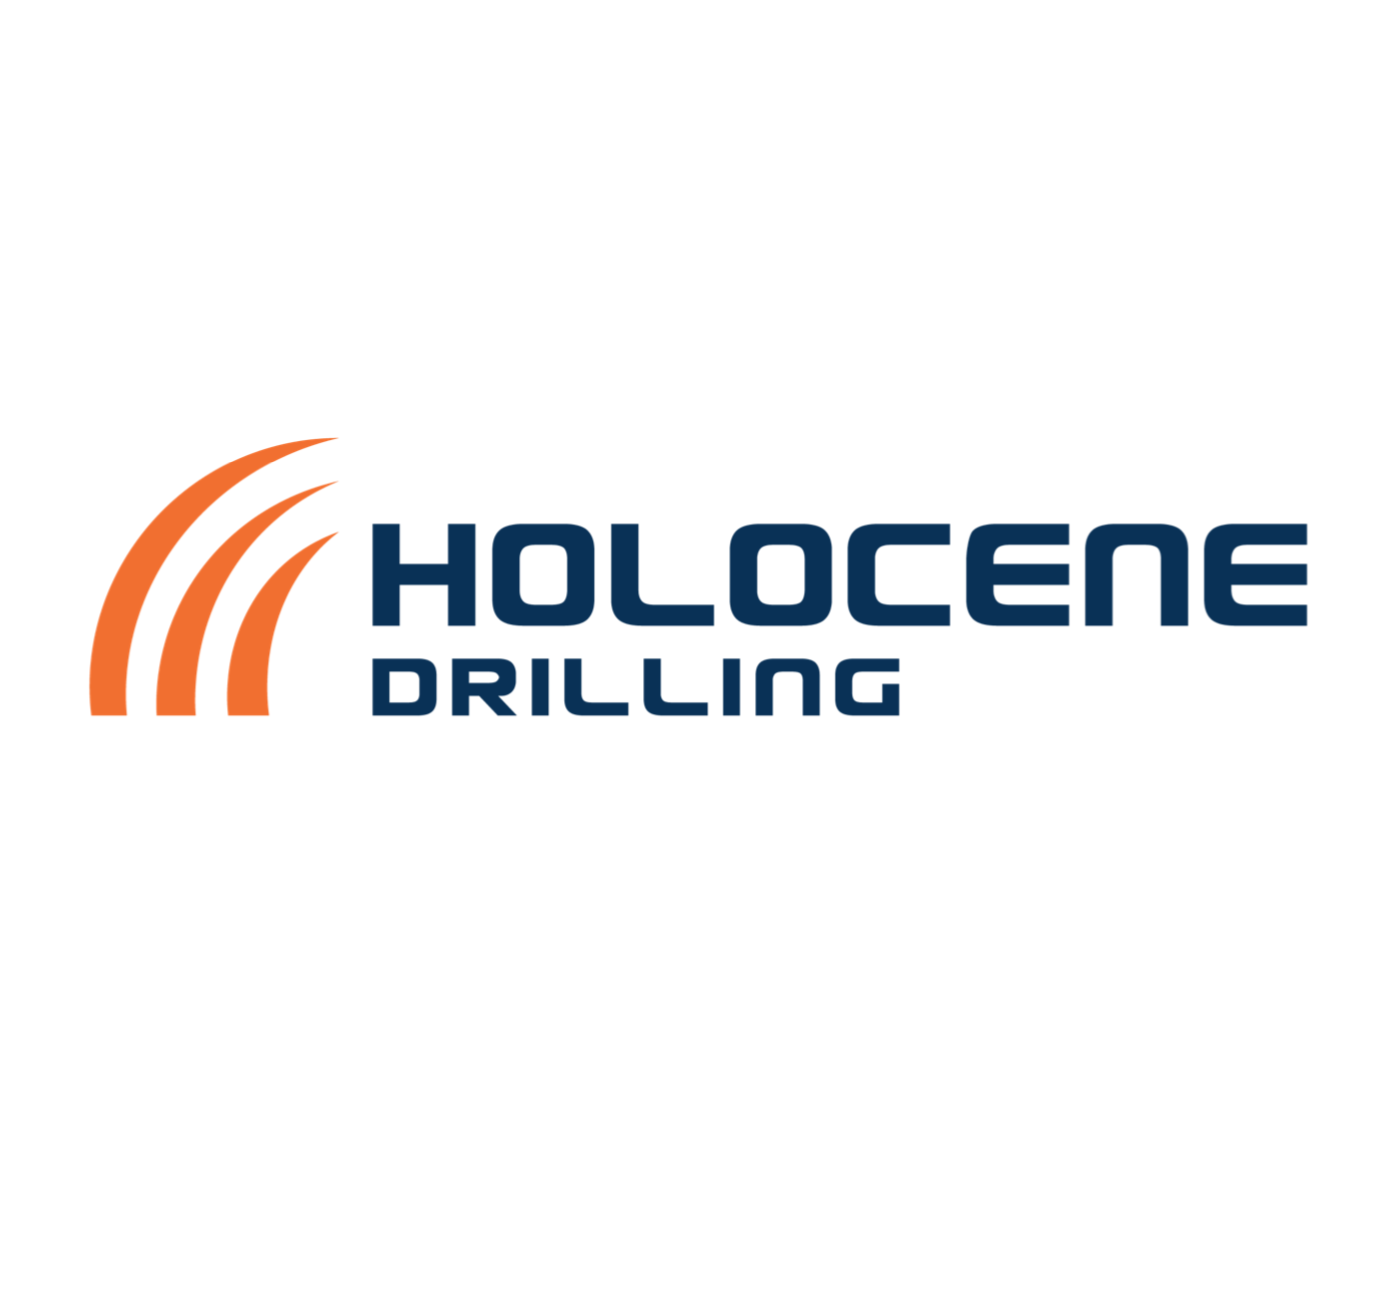 Holocene logo.png